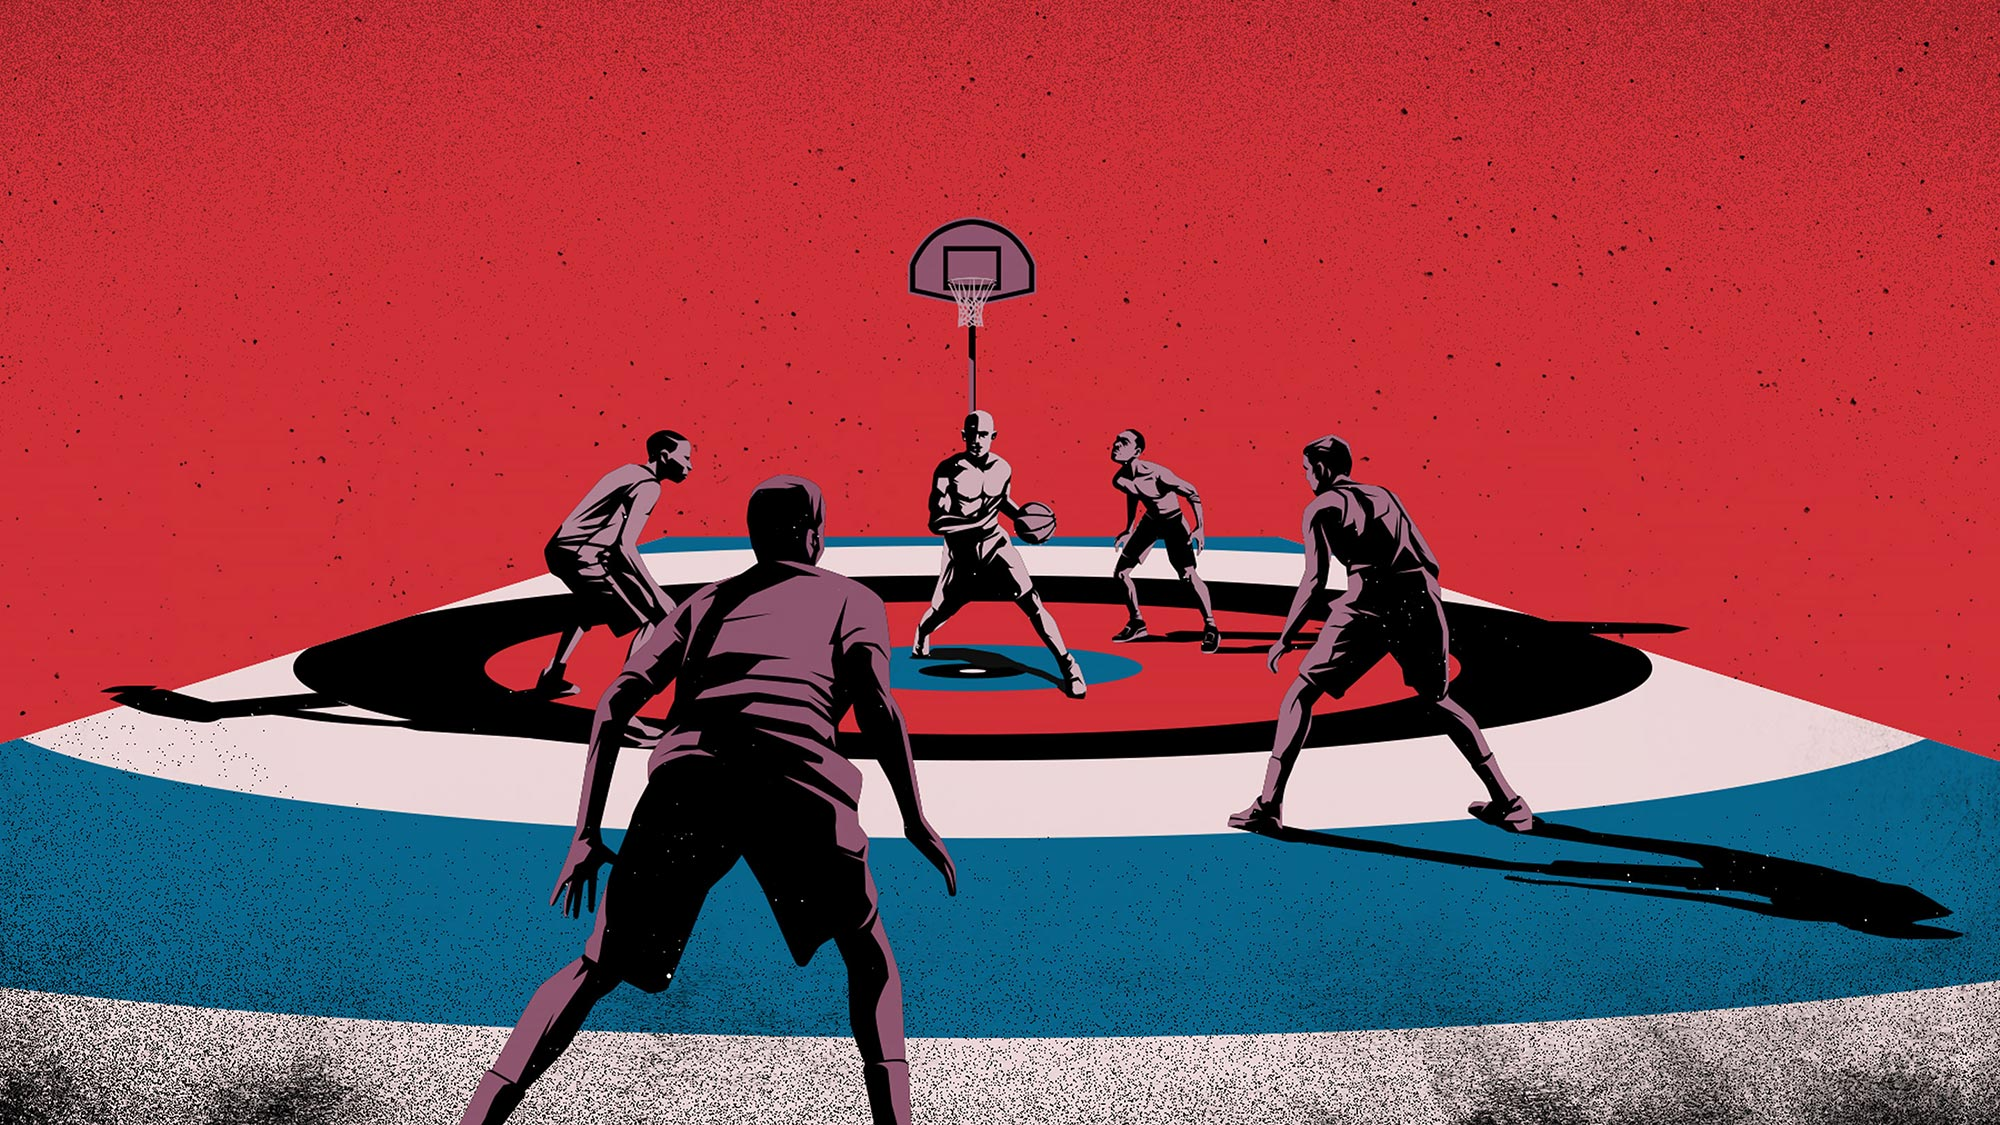 NBA_03